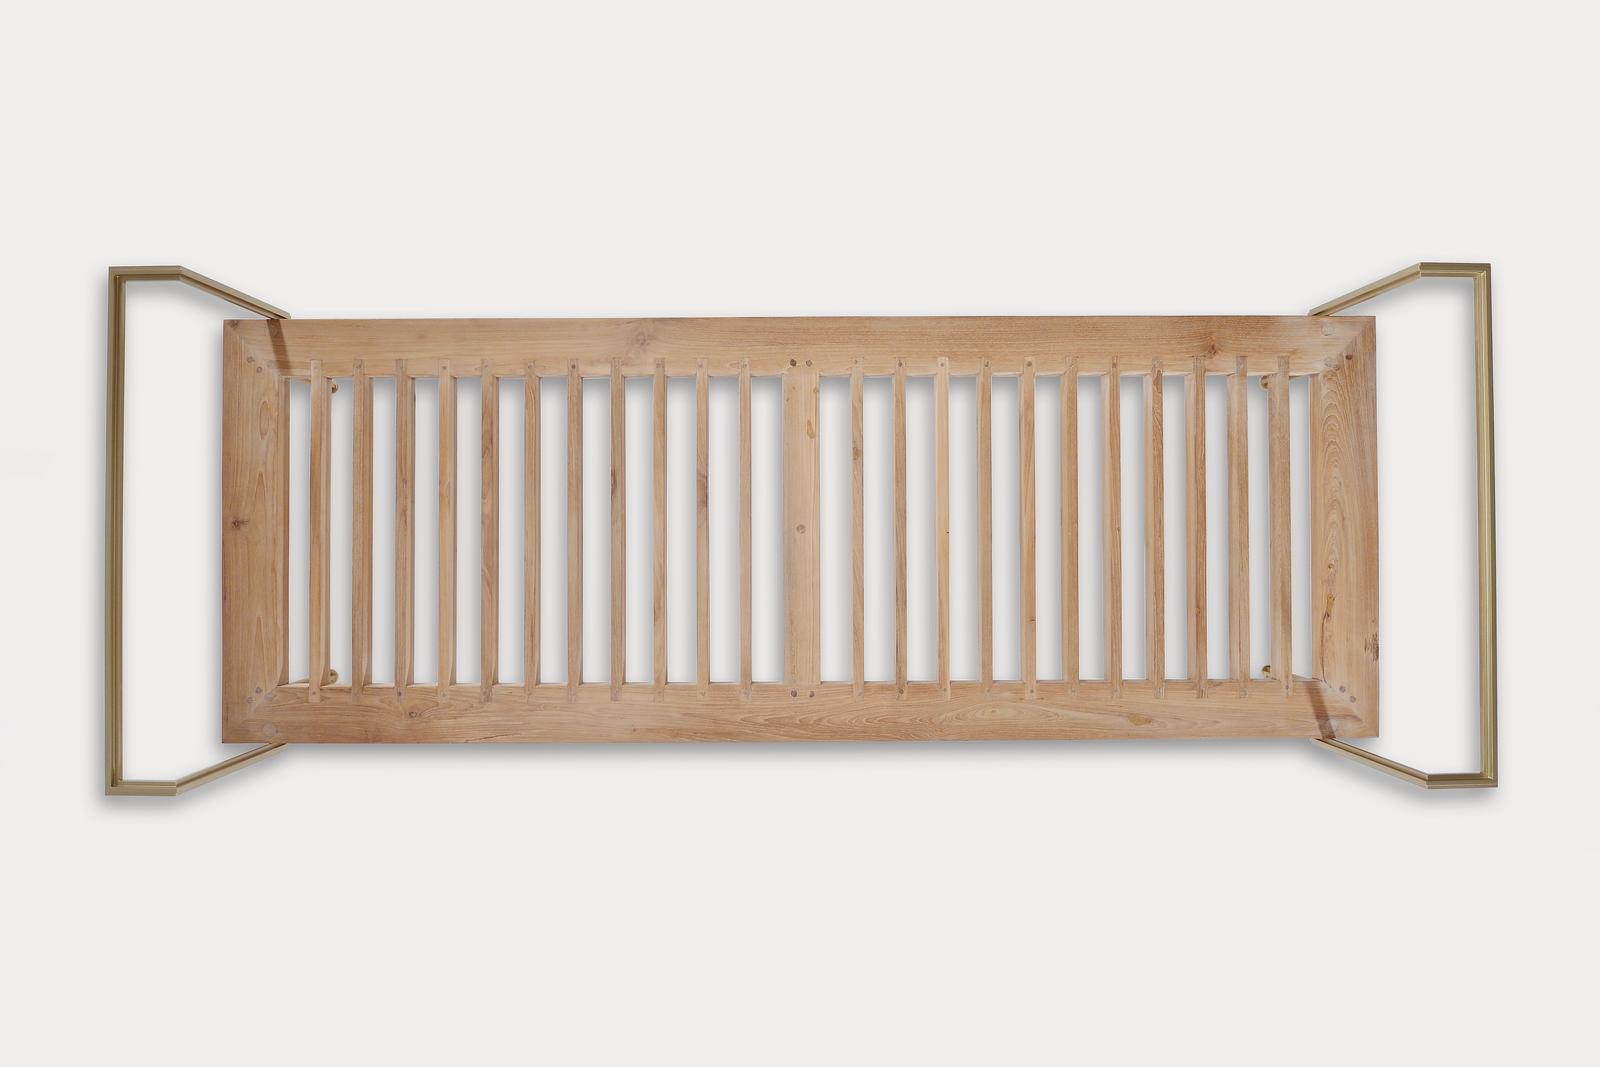 PTendercool-Sofa-PT76-BS1-TE-NO-JD&CO (Garden Tapestry)-190903-10